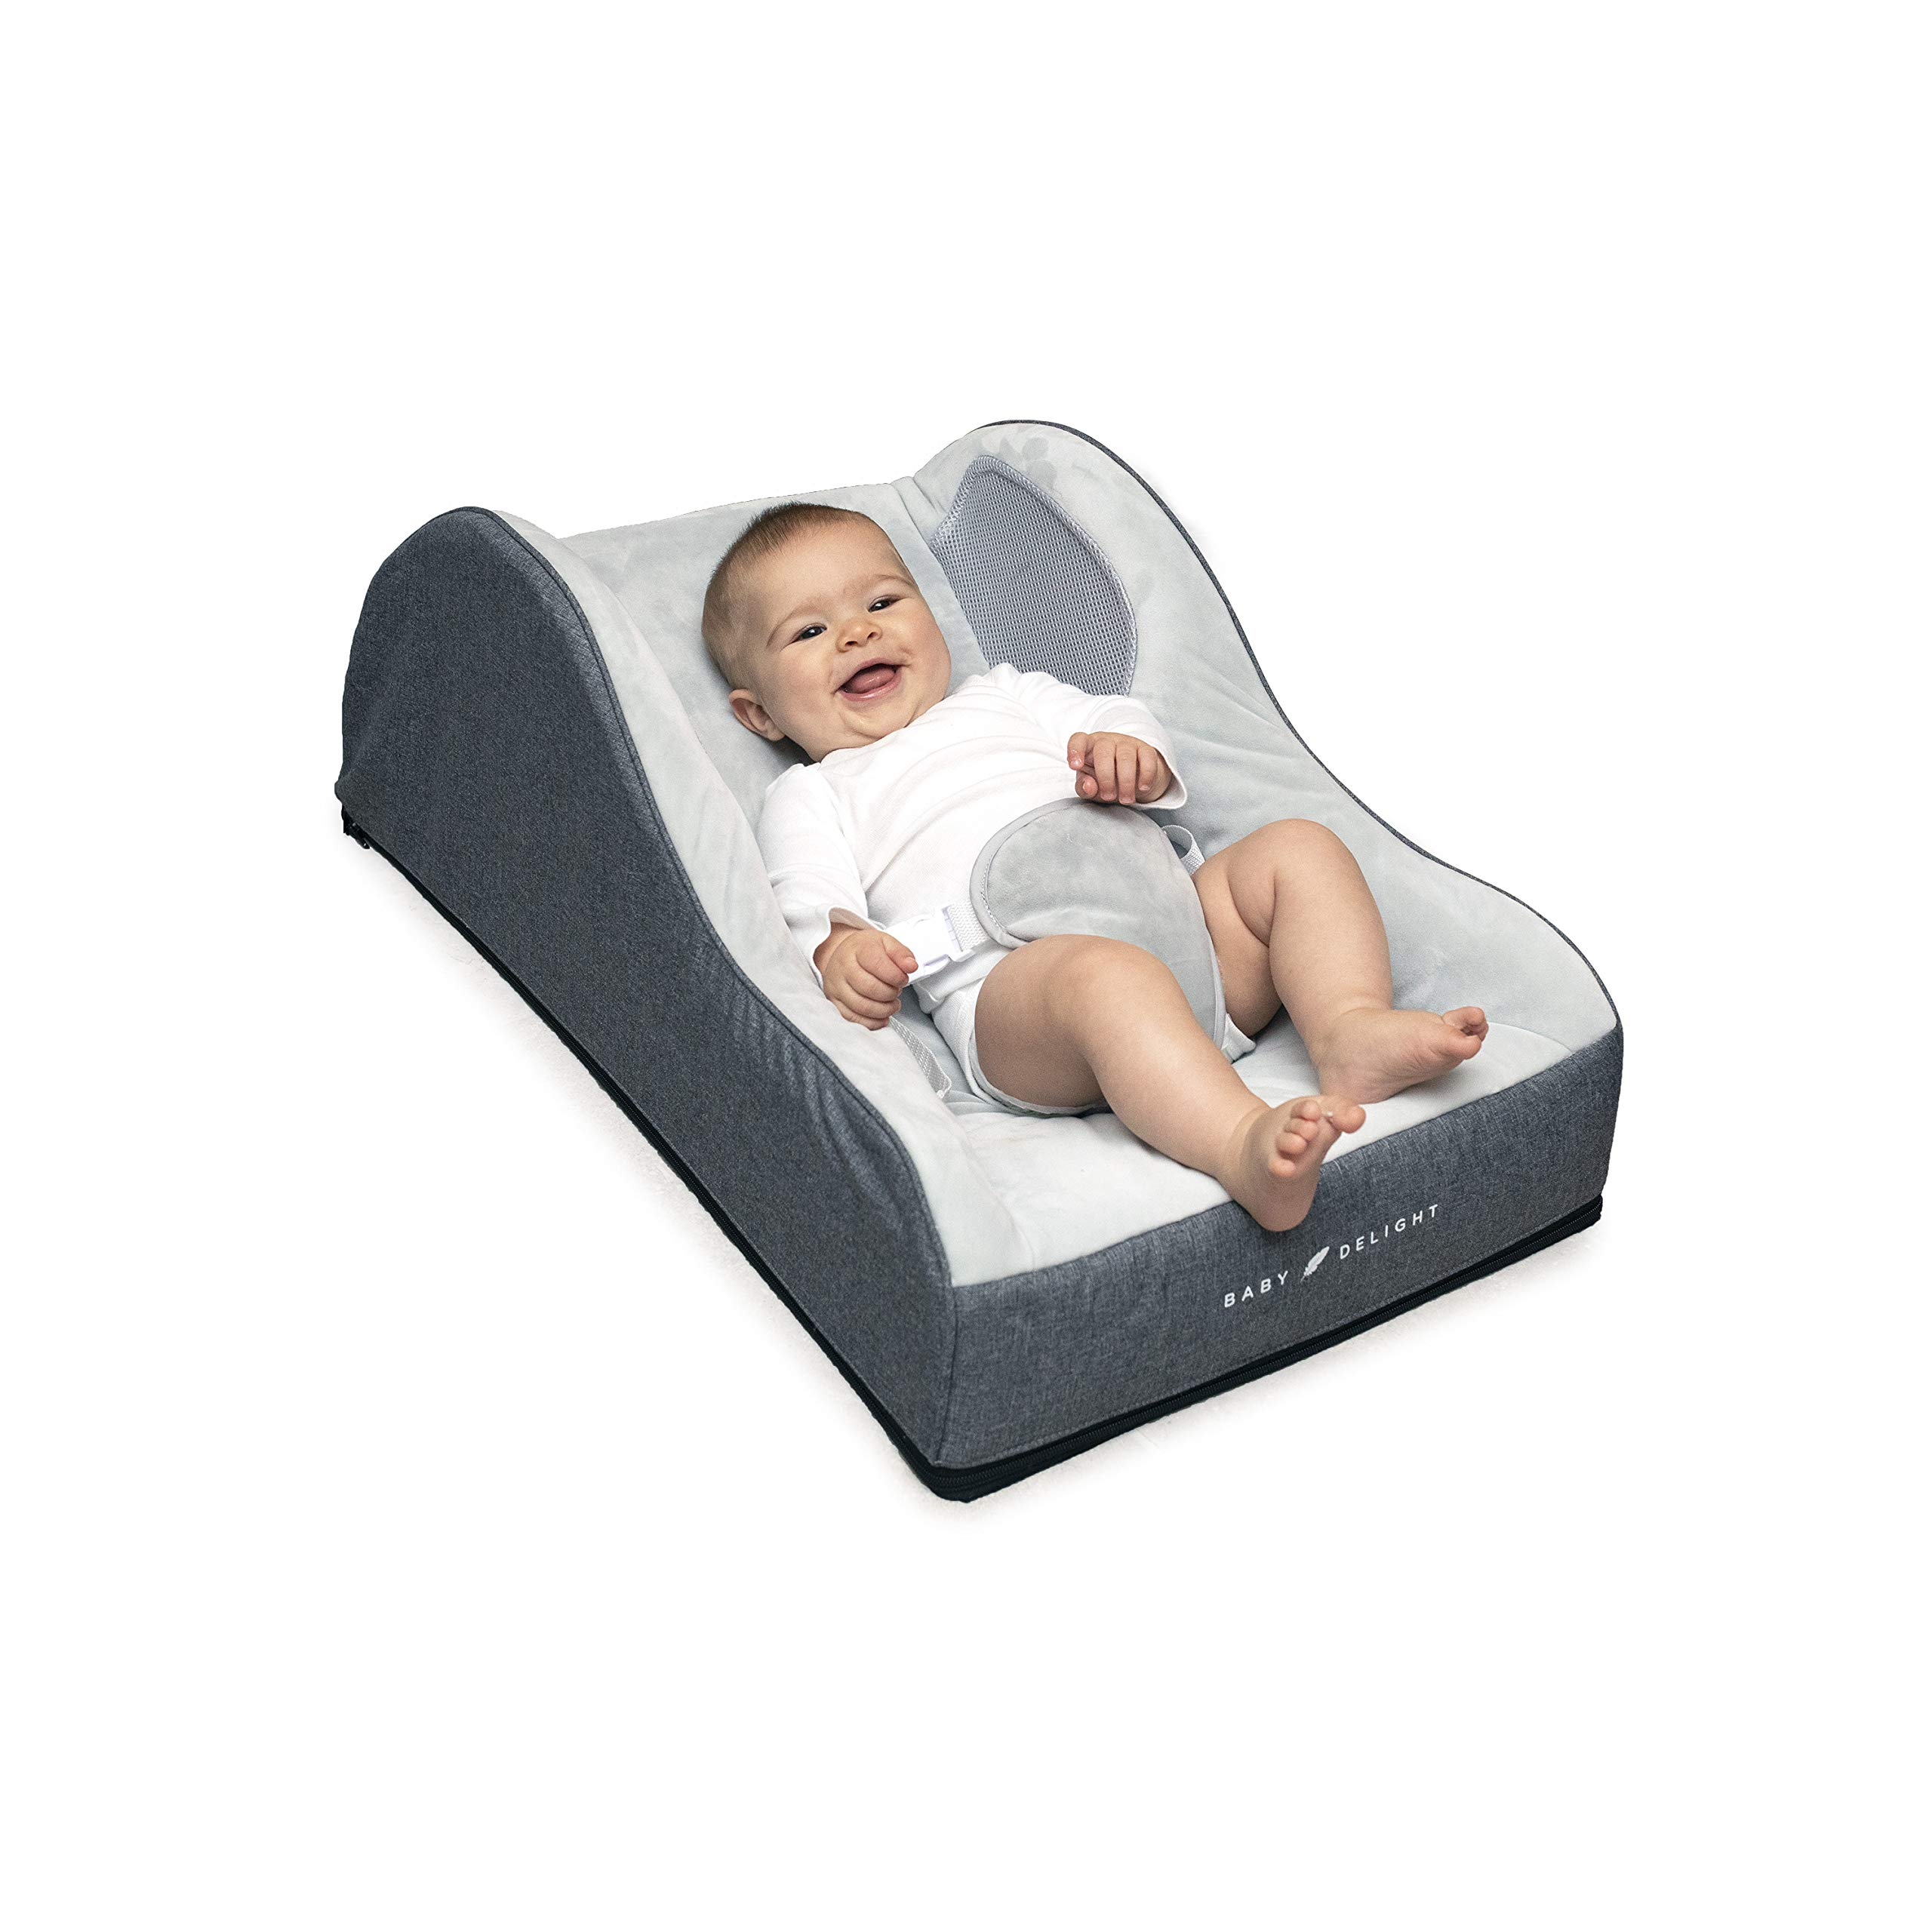 Baby Delight Comfort Nook Plush Infant Napper